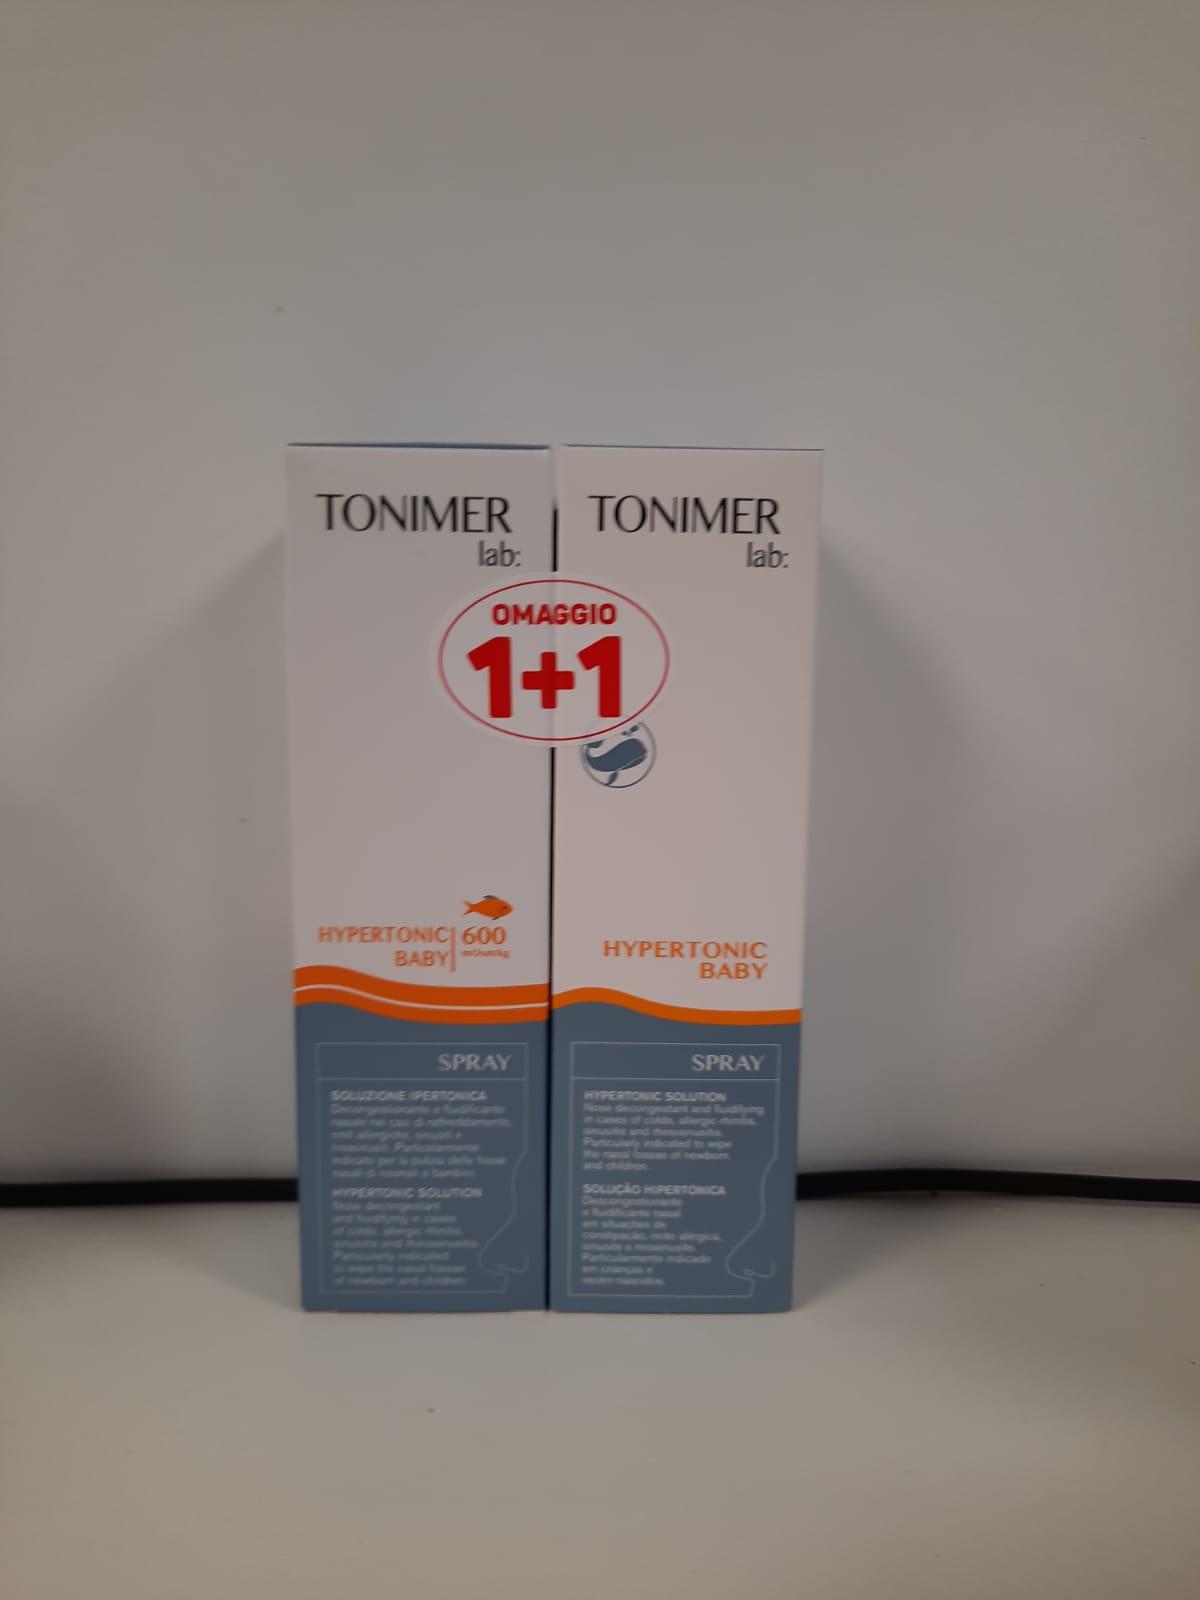 Tonimer Lab Hypertonic Baby Spray 100ml + 100ml 1+1 Omaggio - Arcafarma.it